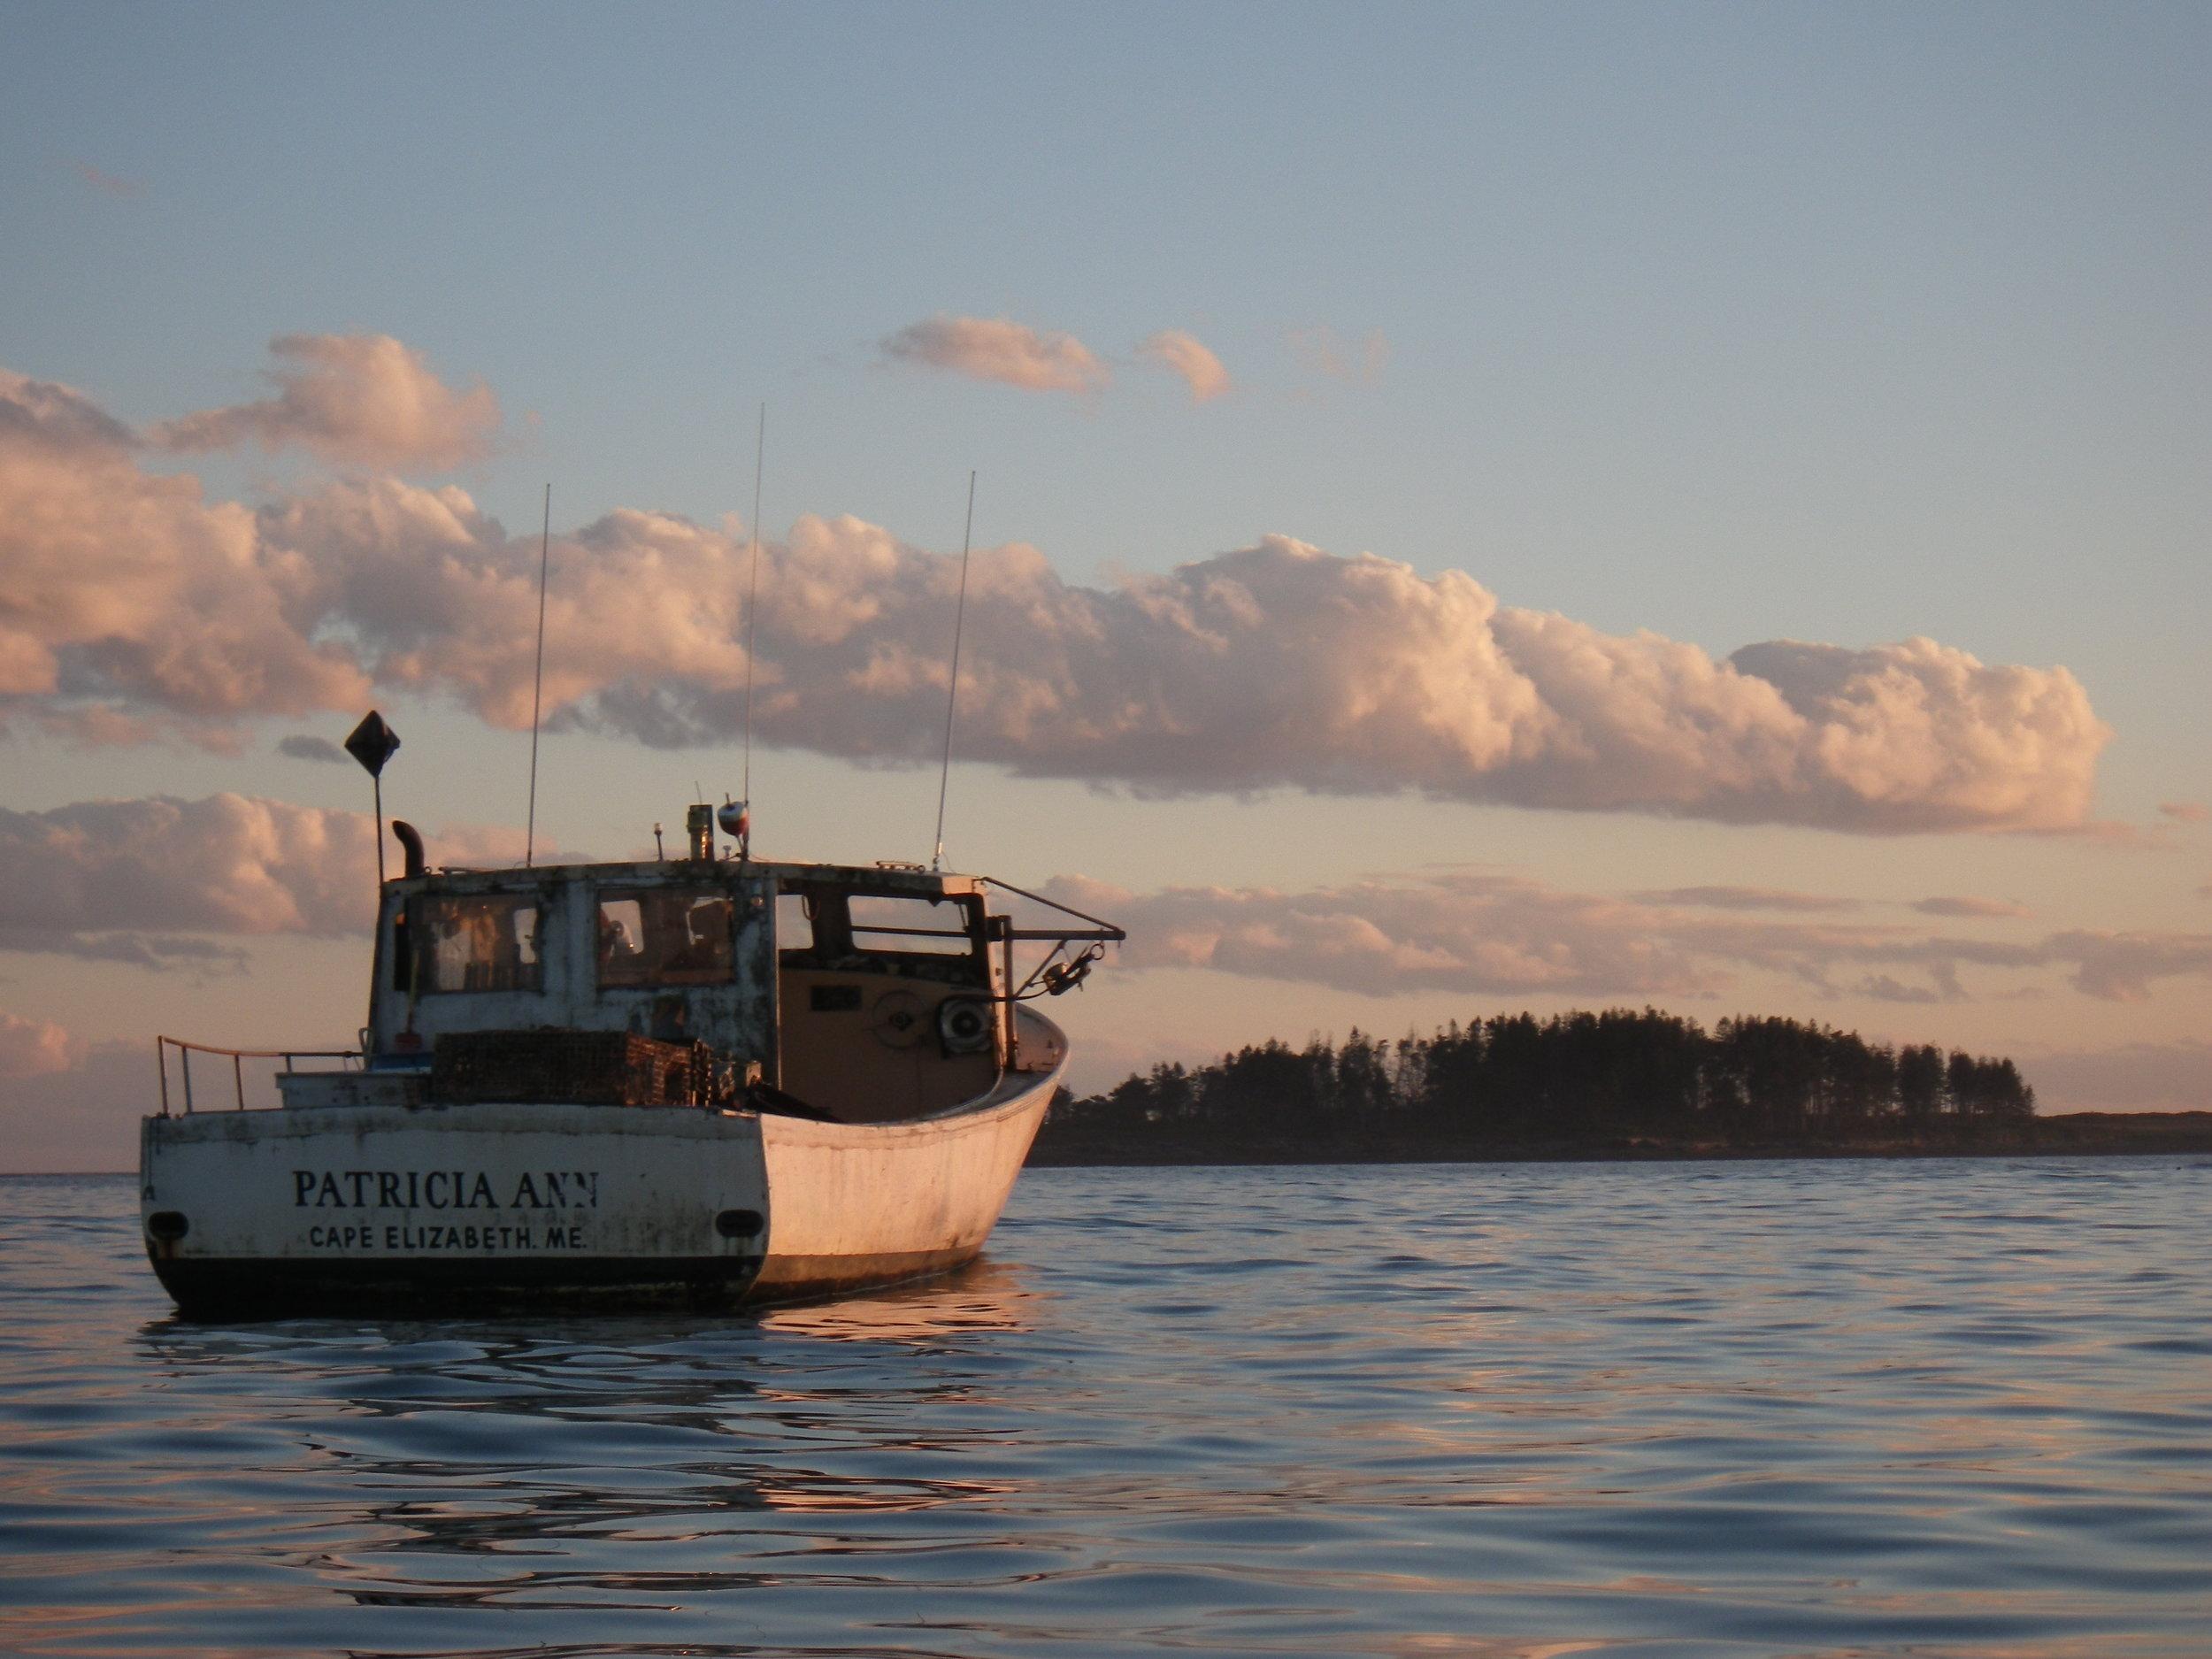 Richmond Island, PHOTO: Joe Guglielmetti